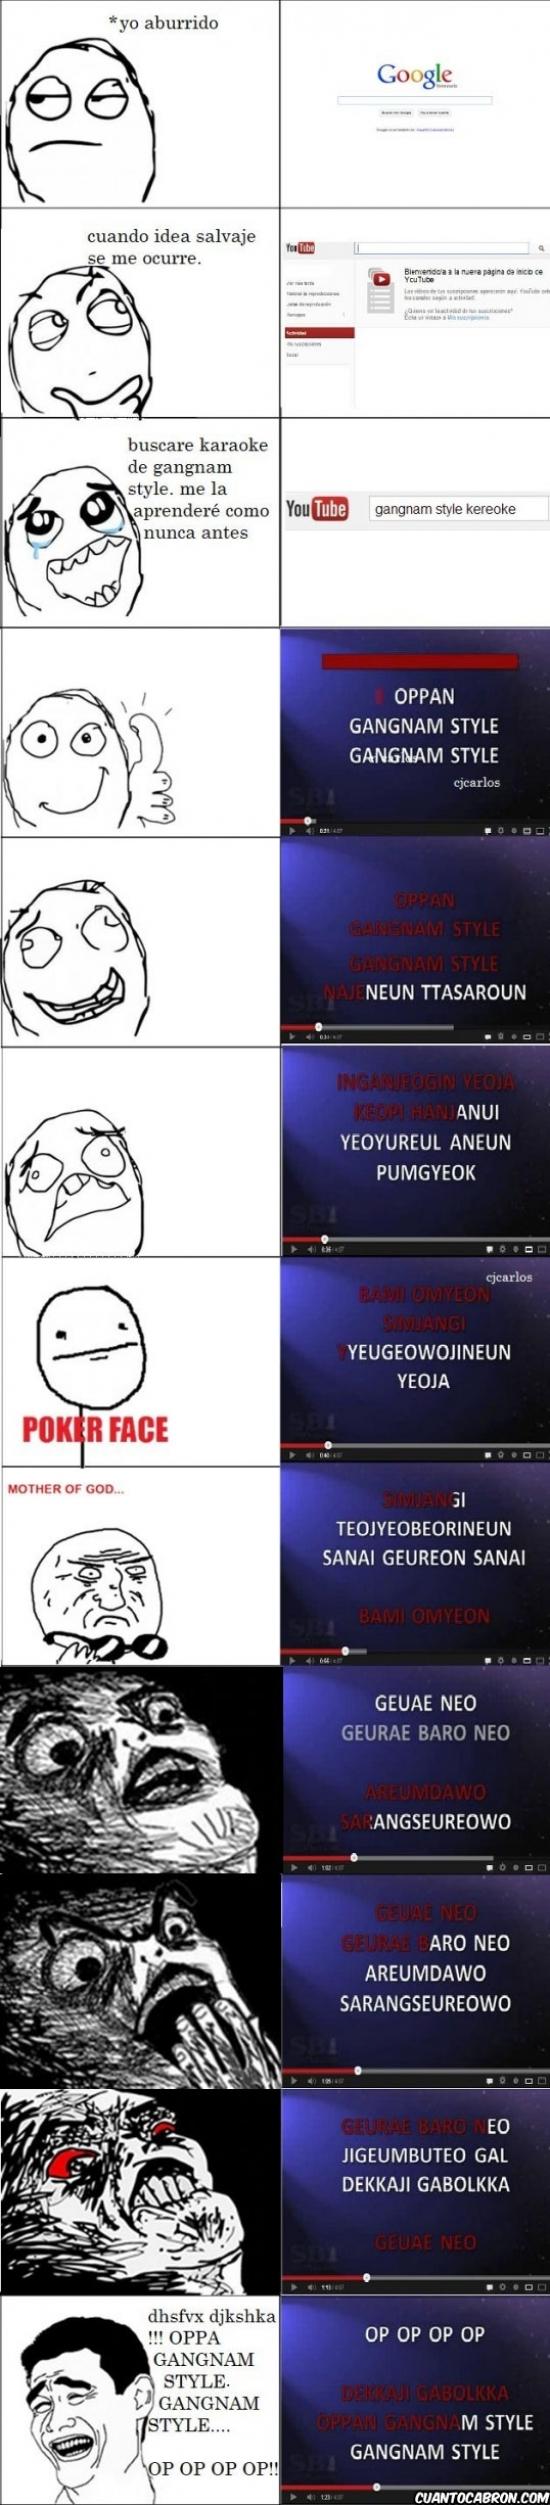 coreano,gangnam style,karaoke,letra imposible,poker face,psy,youtube